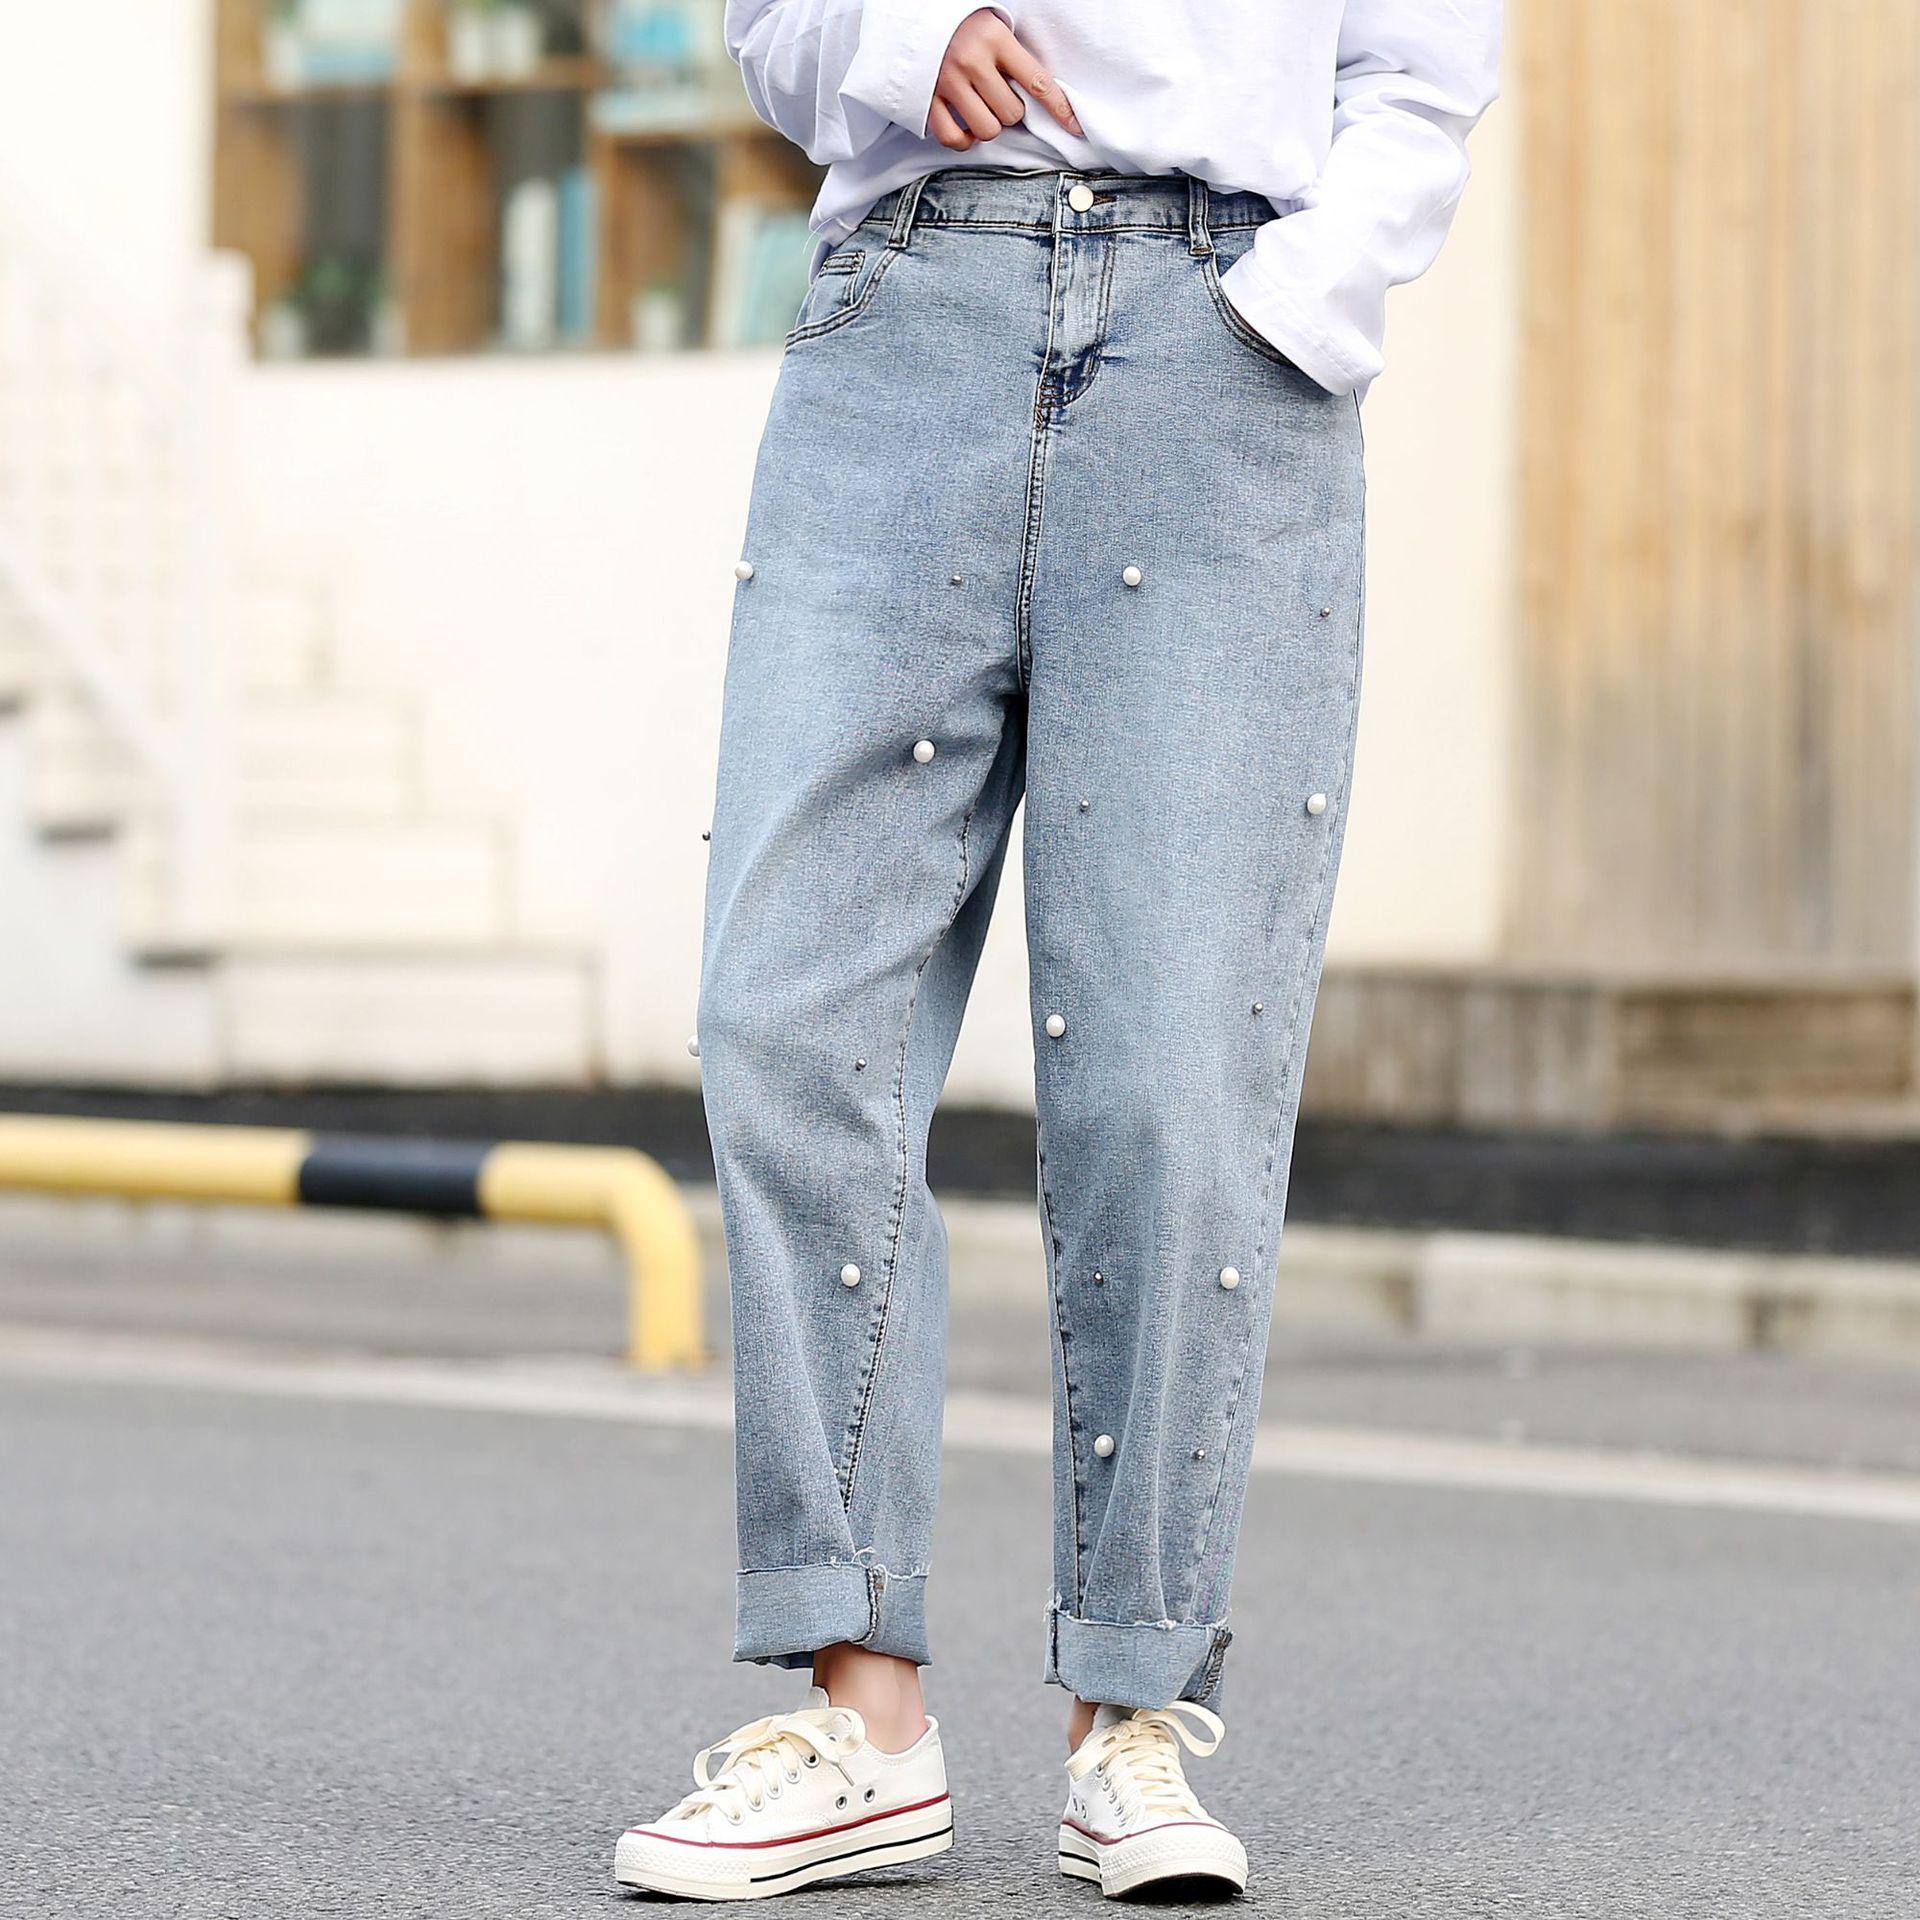 Lady Jeans Spring Plus Size Harem Pants Women Stretch Denim Trousers Blue Female  Beaded Jeans 2020 D6-9246